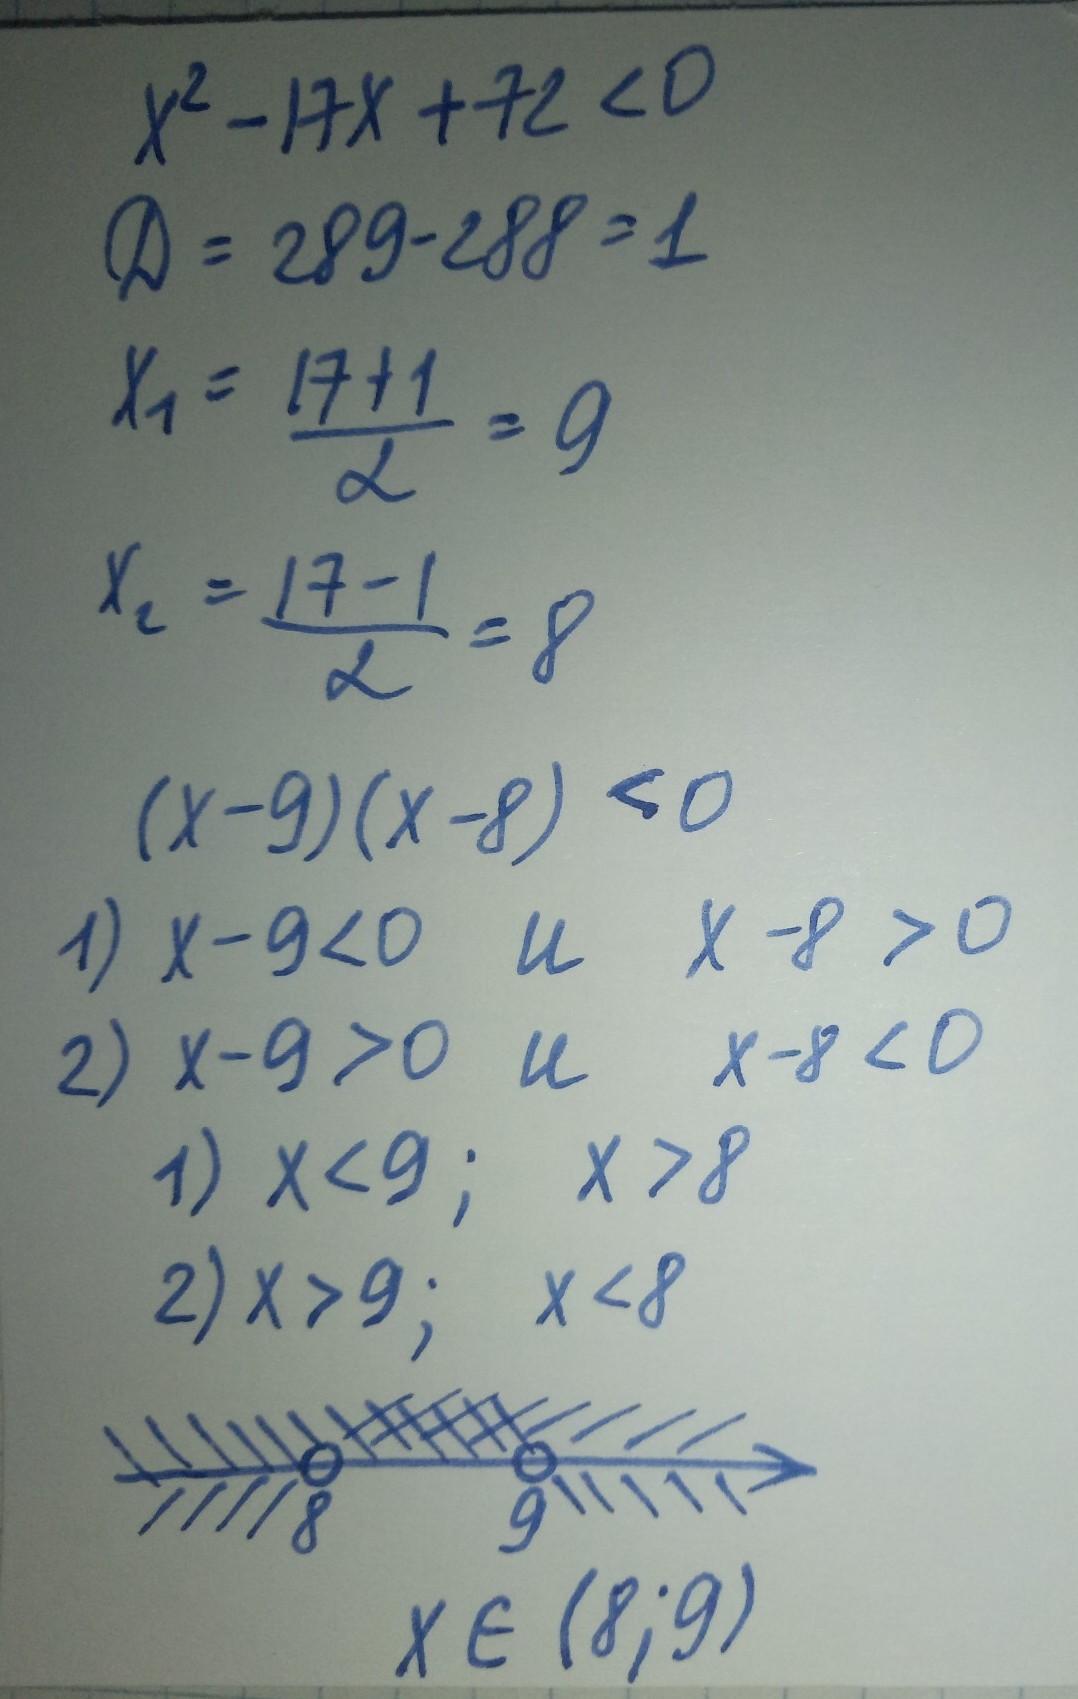 X2-17х+72<0 Помогите решить,пожалуйста!!!